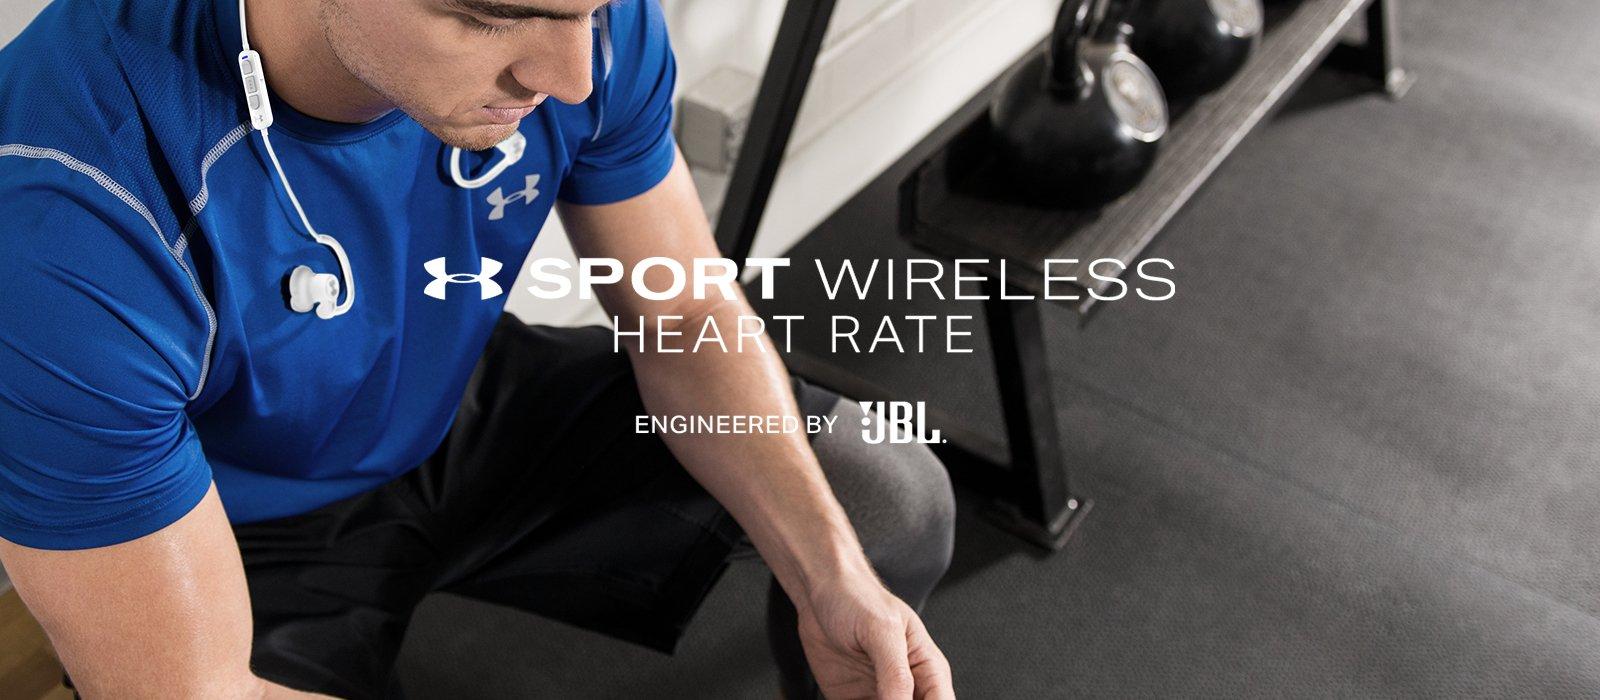 UA Sport Wireless Engineered By JBL